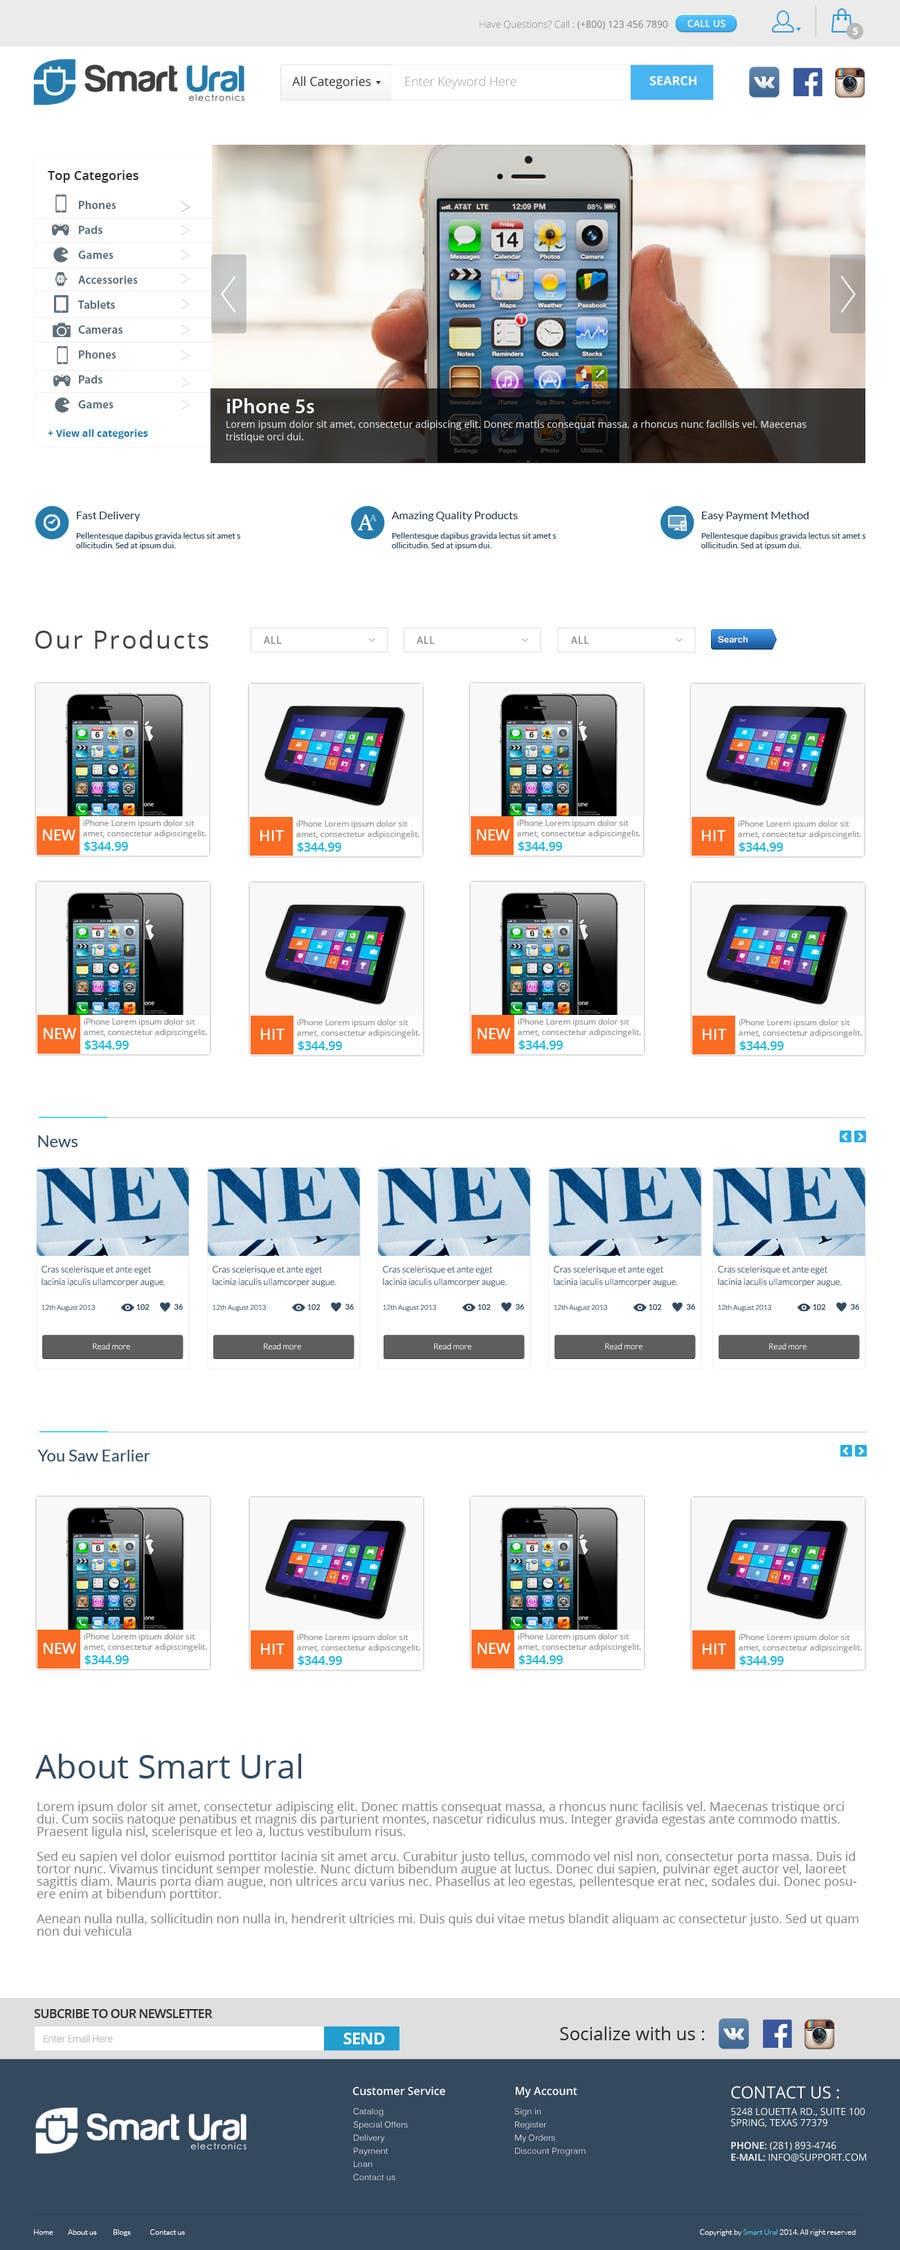 Penyertaan Peraduan #                                        11                                      untuk                                         Develop a mockup for main page of e-commerce site